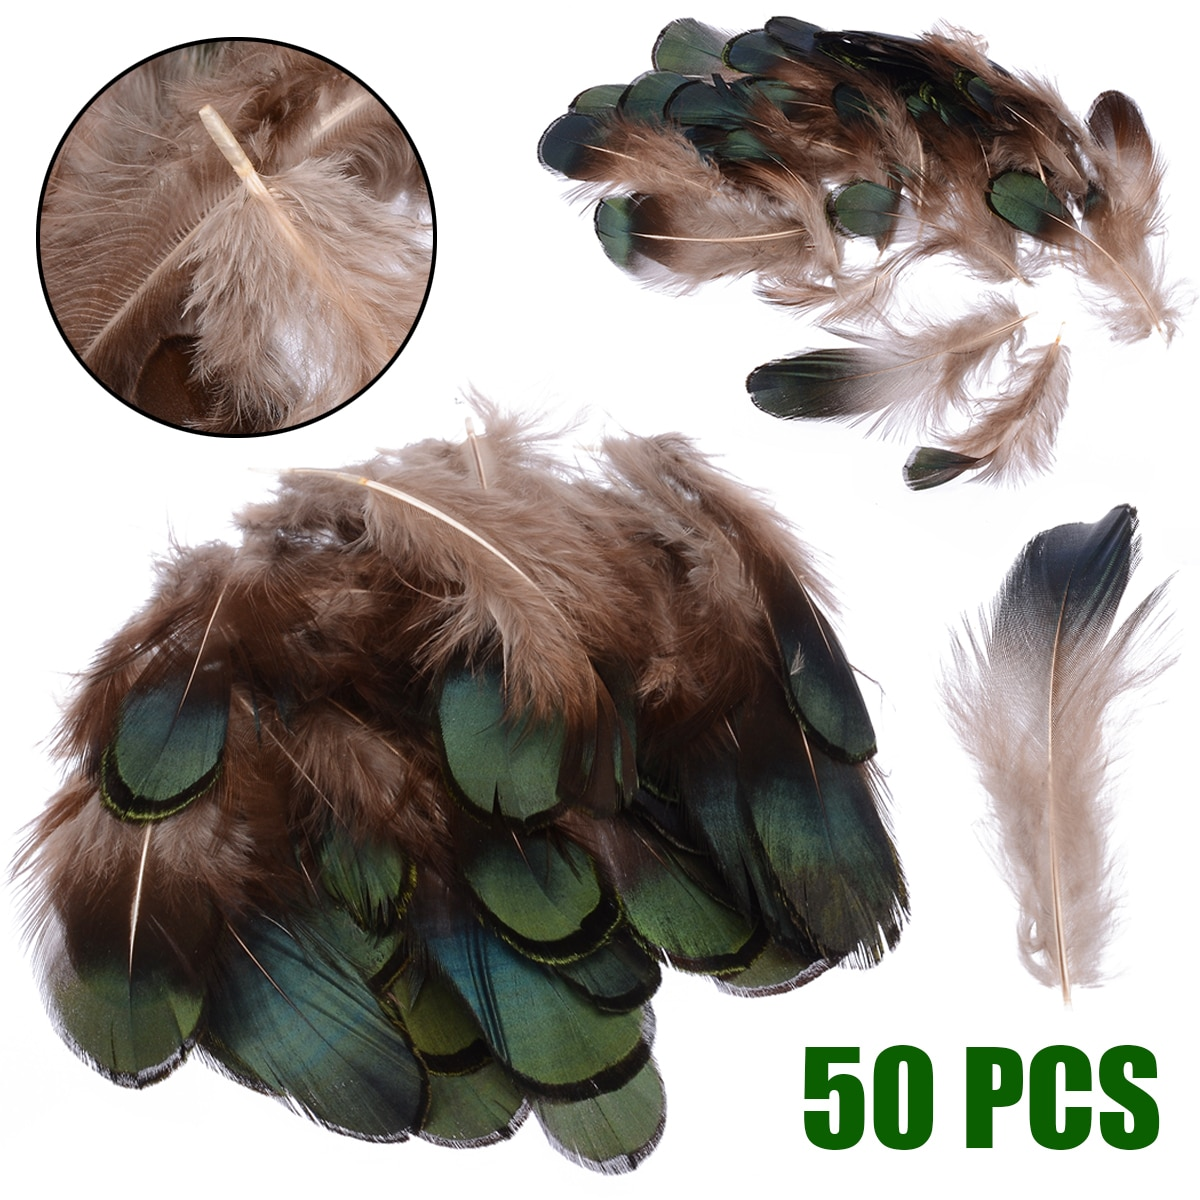 50 Uds verde Natural faisán plumas de cola de gallo plumas 2,5x7 cm para ropa, costura decoración DIY